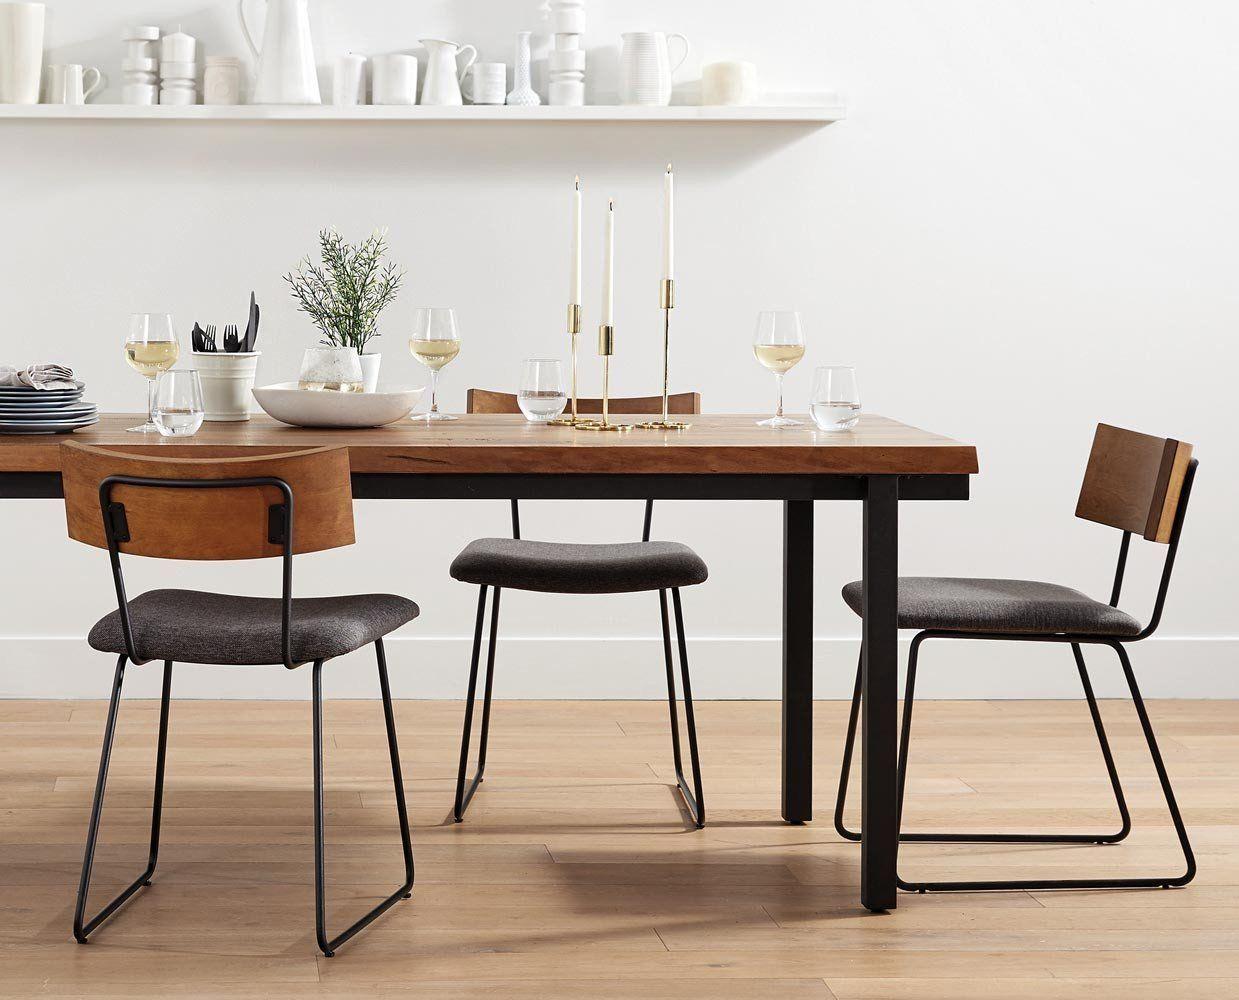 Karsten Dining Chair Rustic Industrial Dining Chair Minimalist Dining Room Industrial Dining Chairs